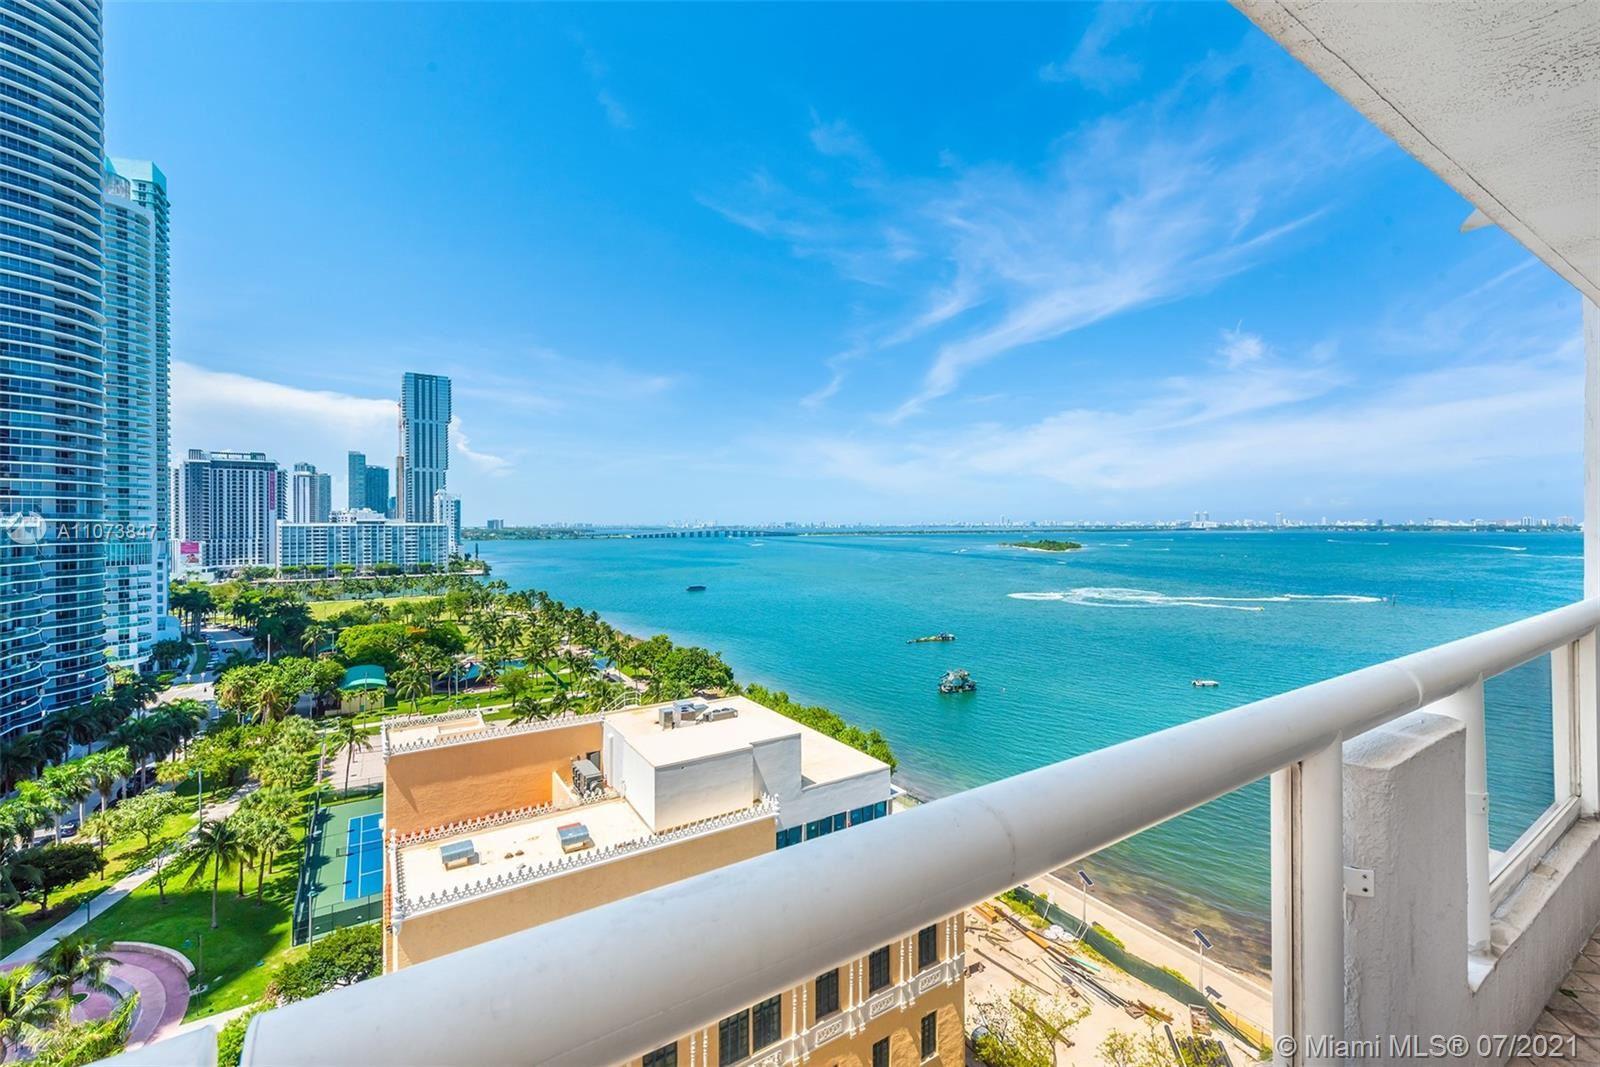 1717 N Bayshore Dr #A-1737, Miami, FL 33132 - #: A11073847